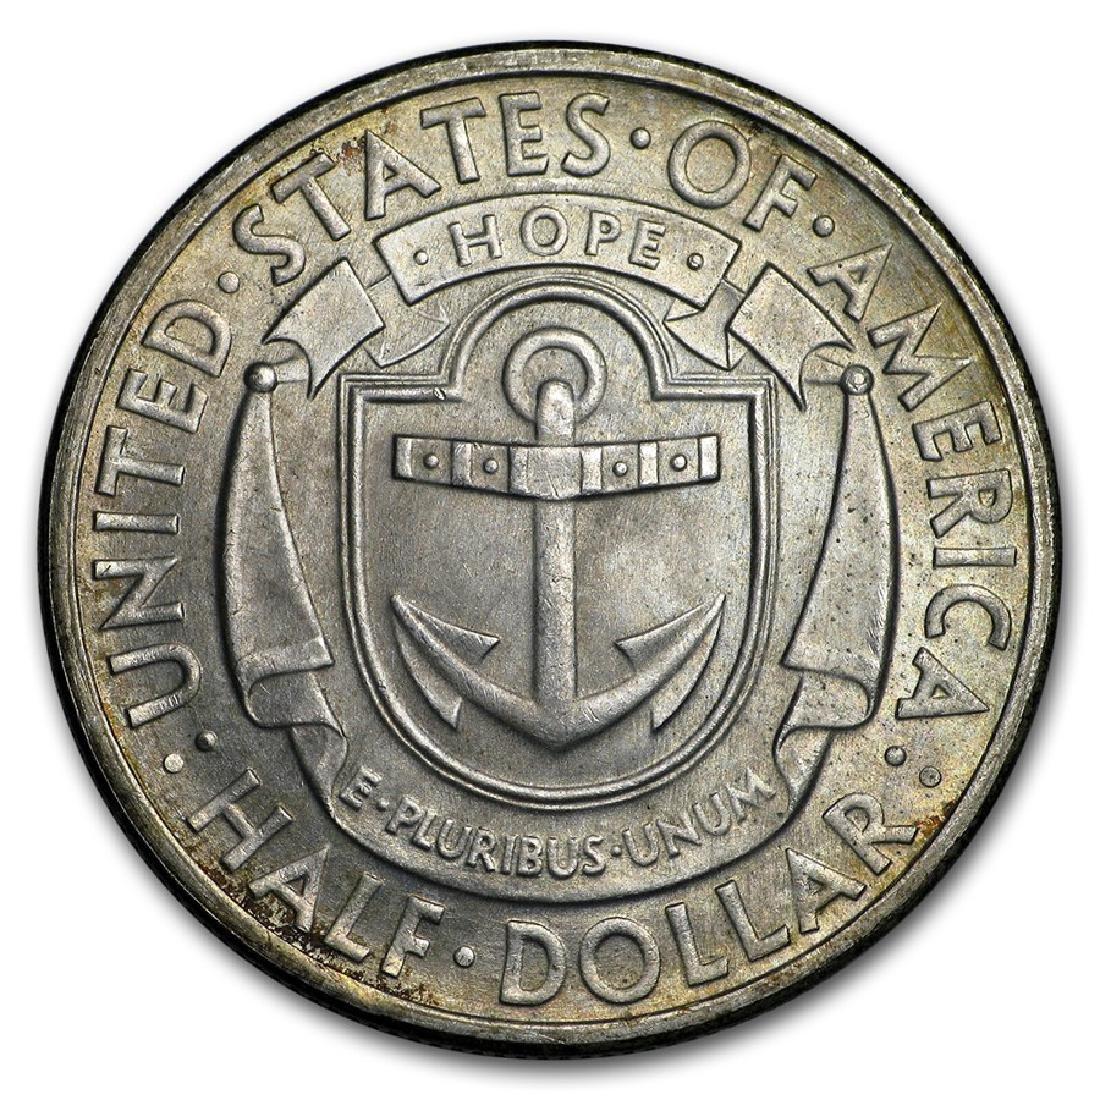 1936-D Rhode Island Half Dollar Coin - 2